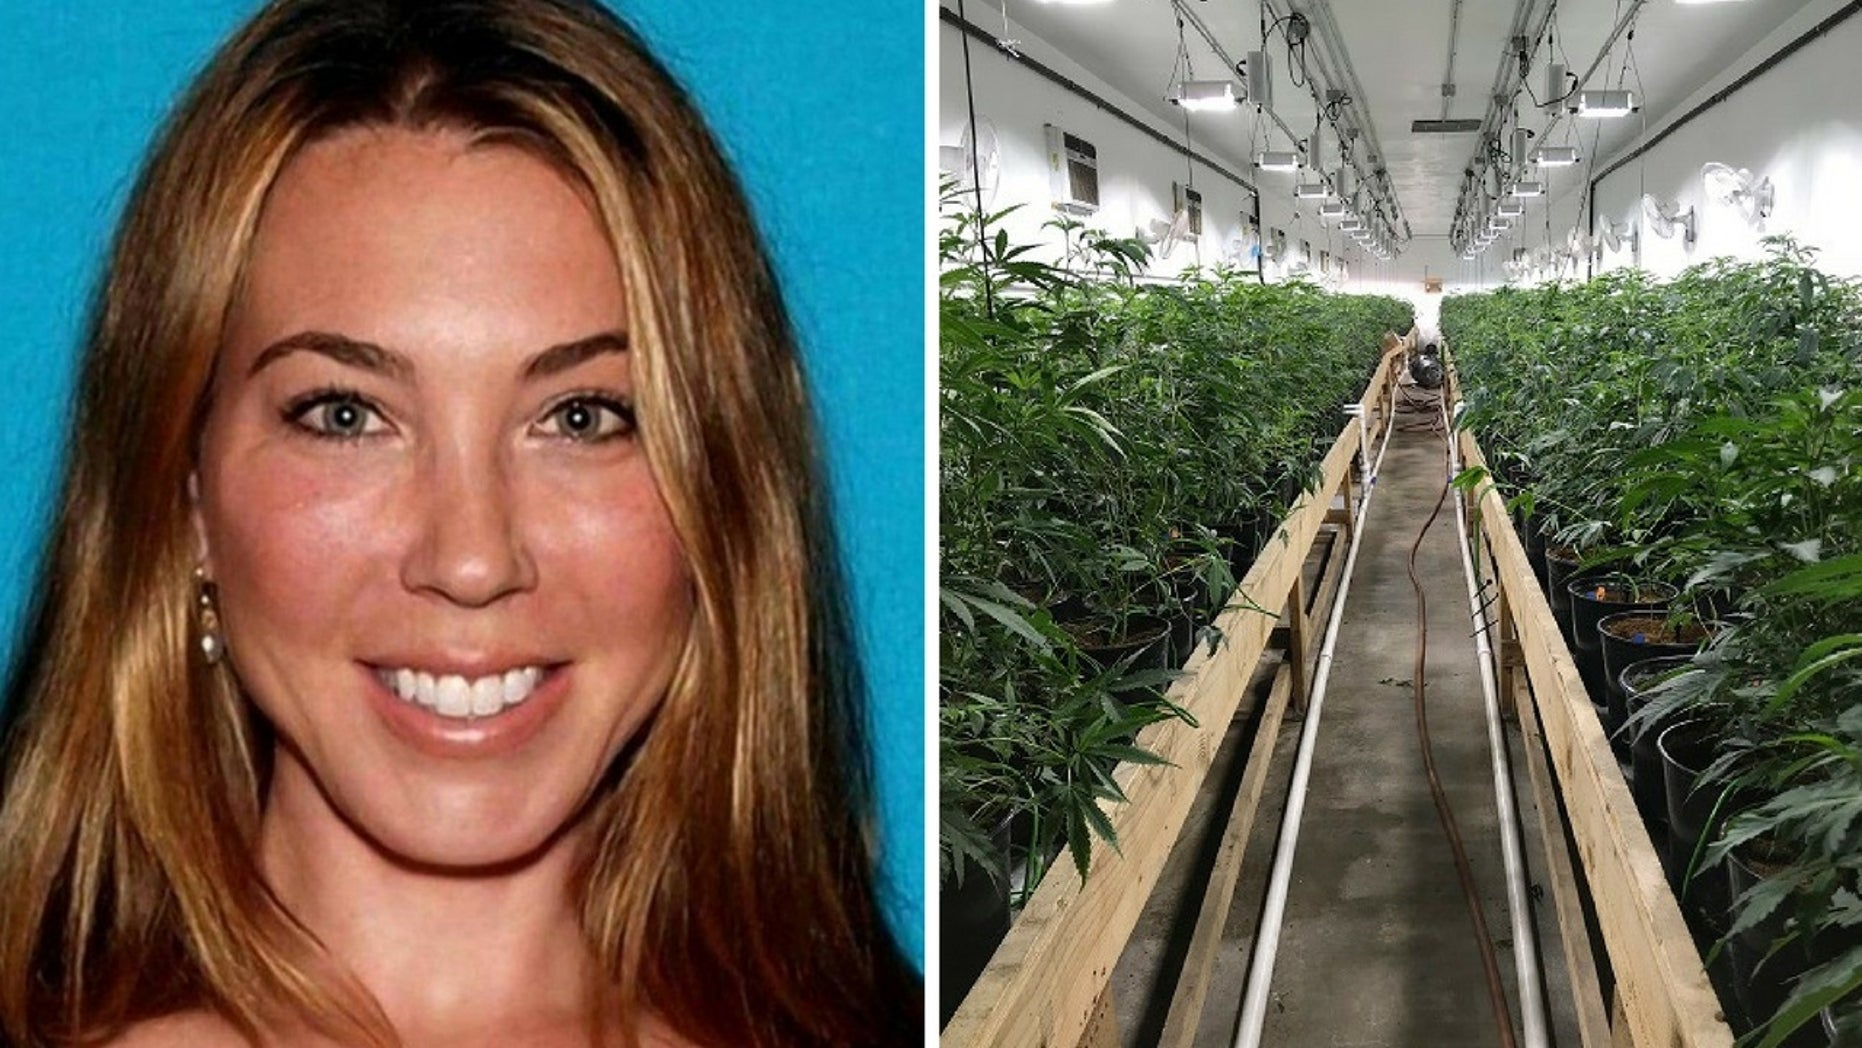 Stephanie Smith, 43, owned three properties that grew thousands of marijuana plants, police said.